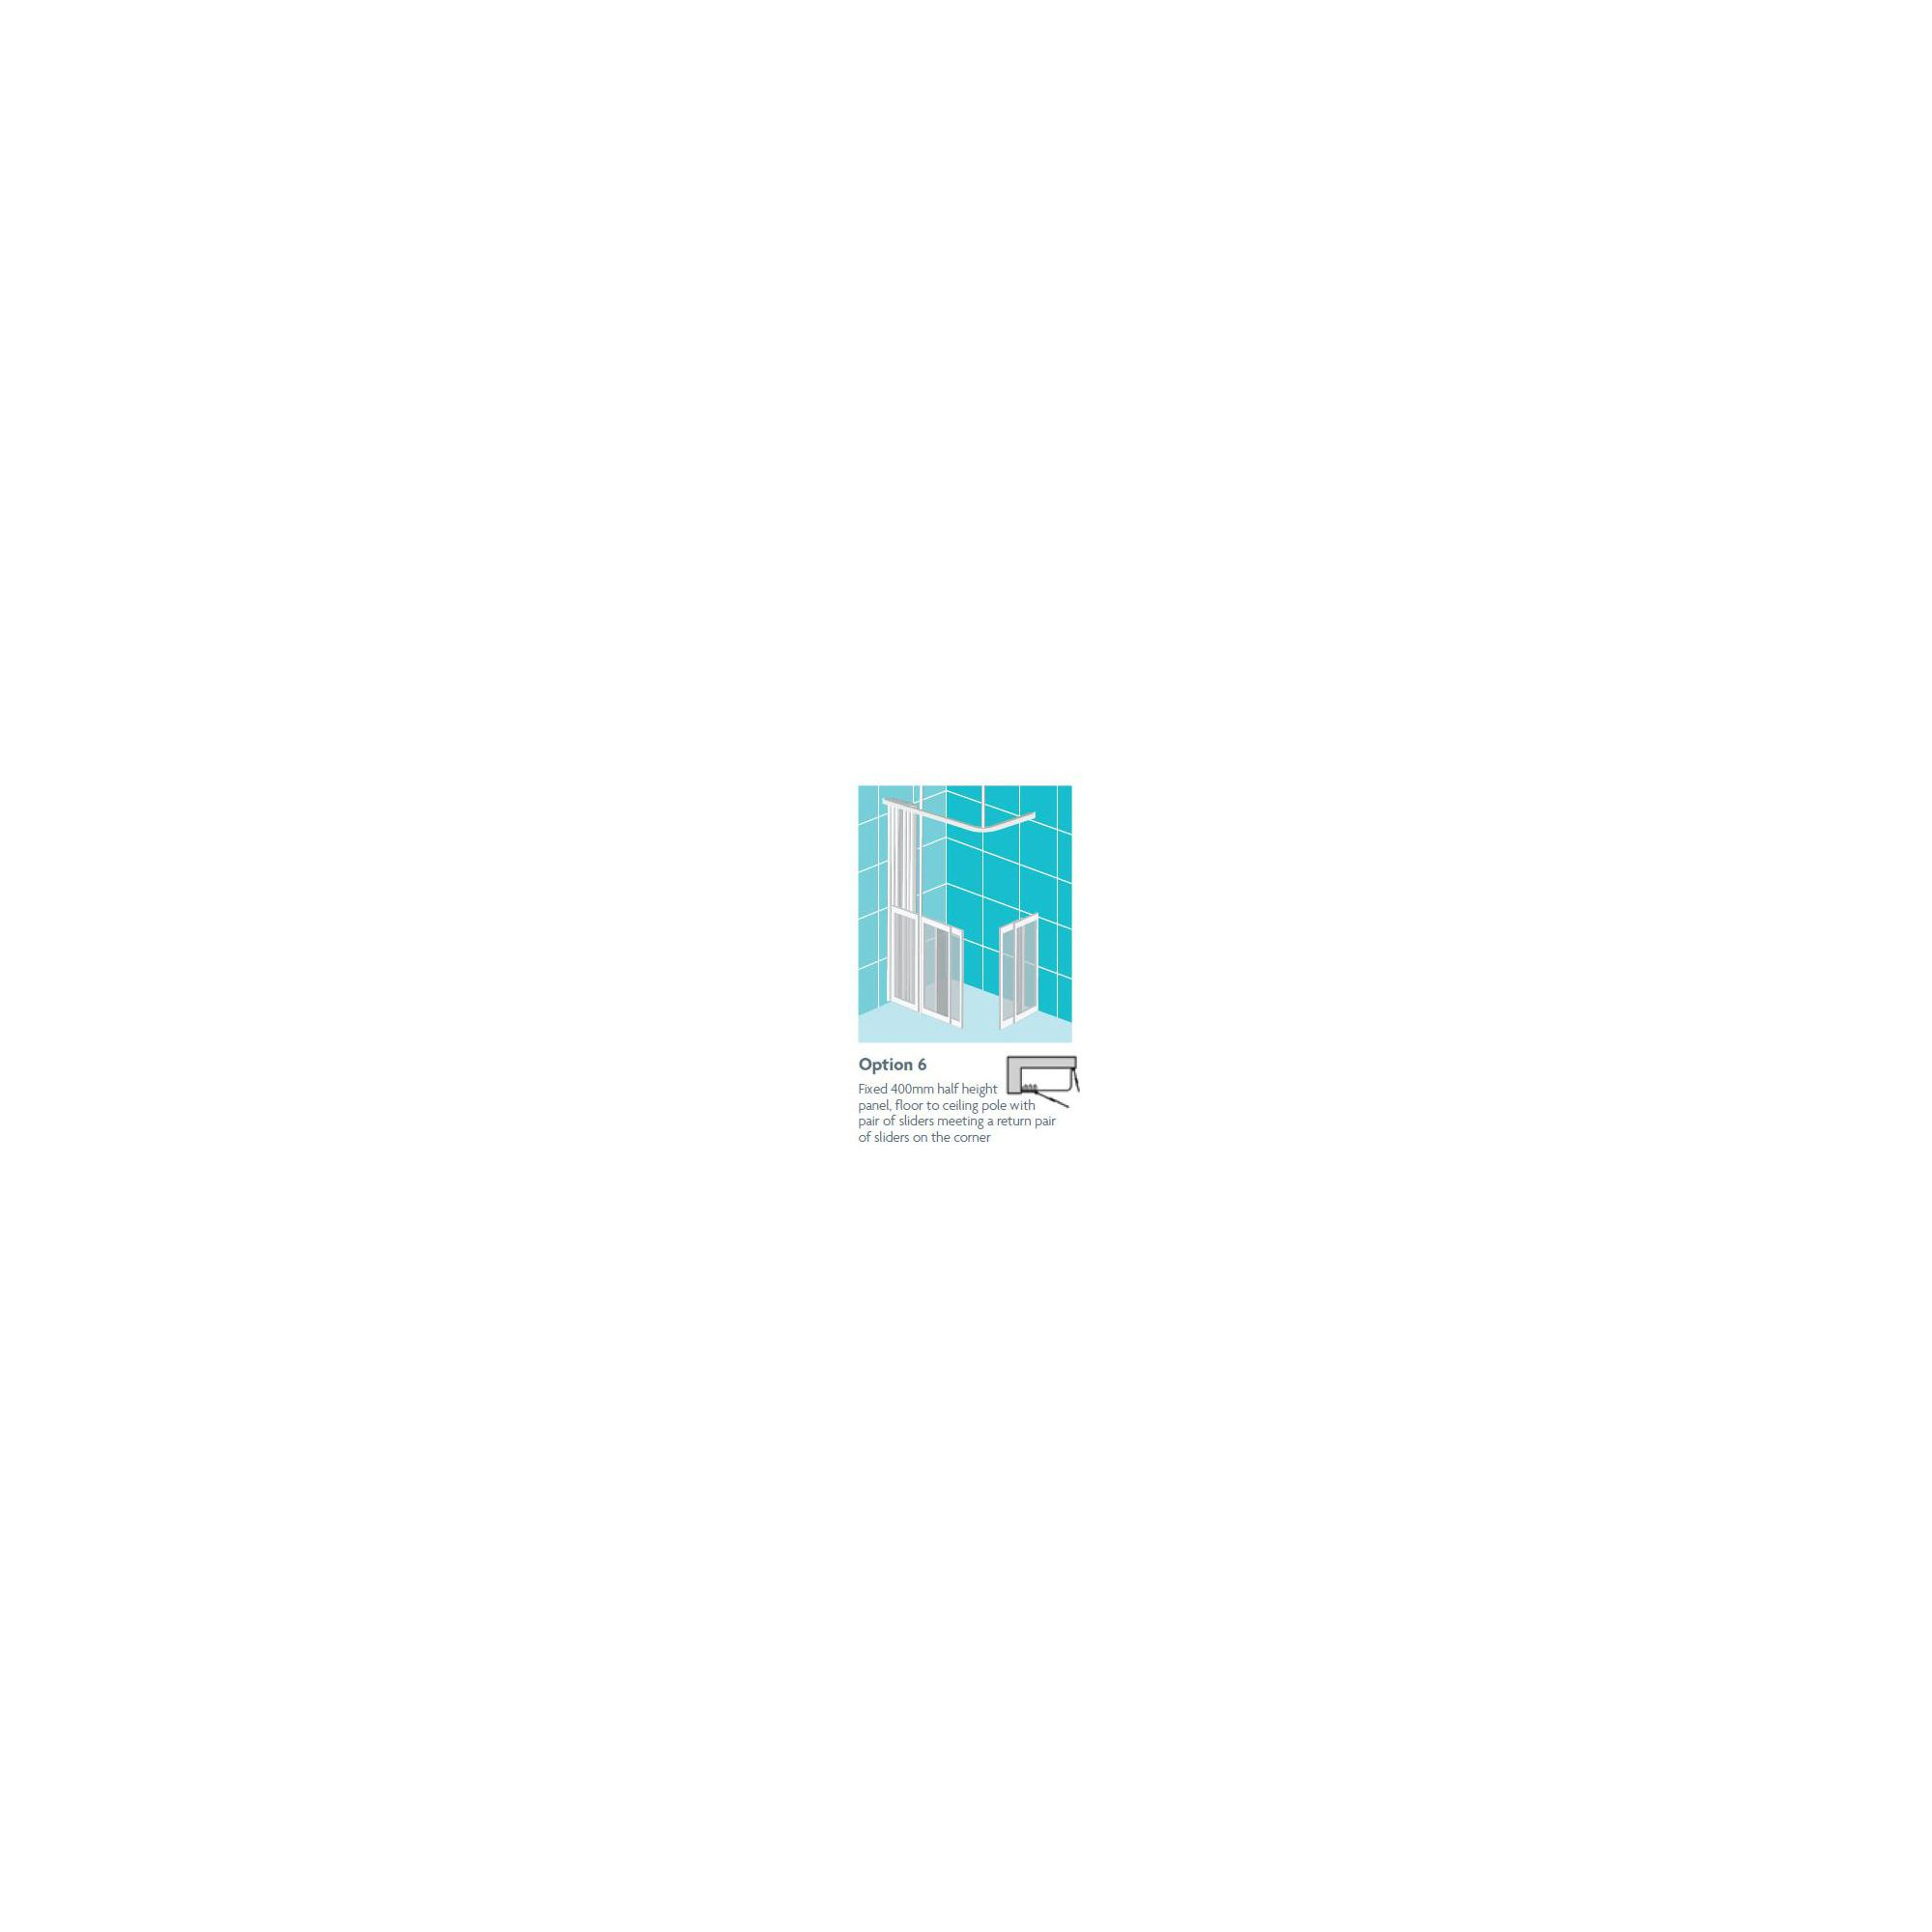 Impey Supreme Corner Door Option 6 Left Hand 1500mm x 710mm at Tescos Direct